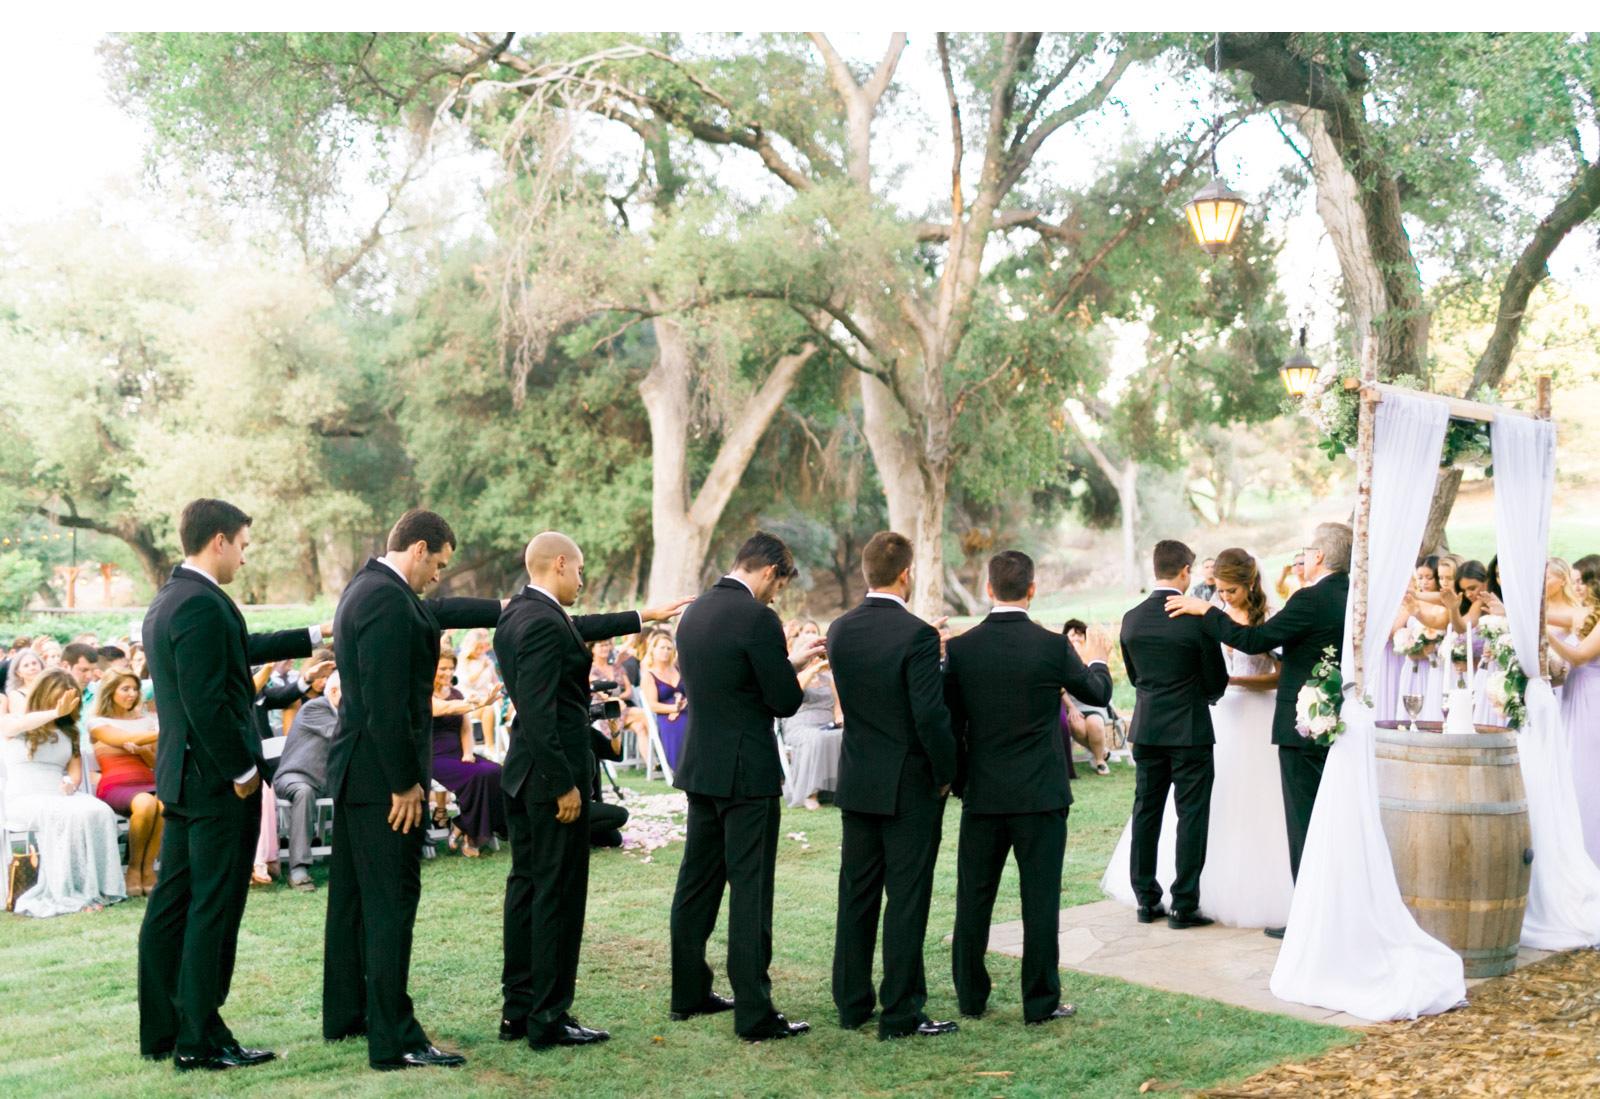 Nia-Sanchez-Miss-USA-Temecula-Wedding-Natalie-Schutt-Photography_04.jpg